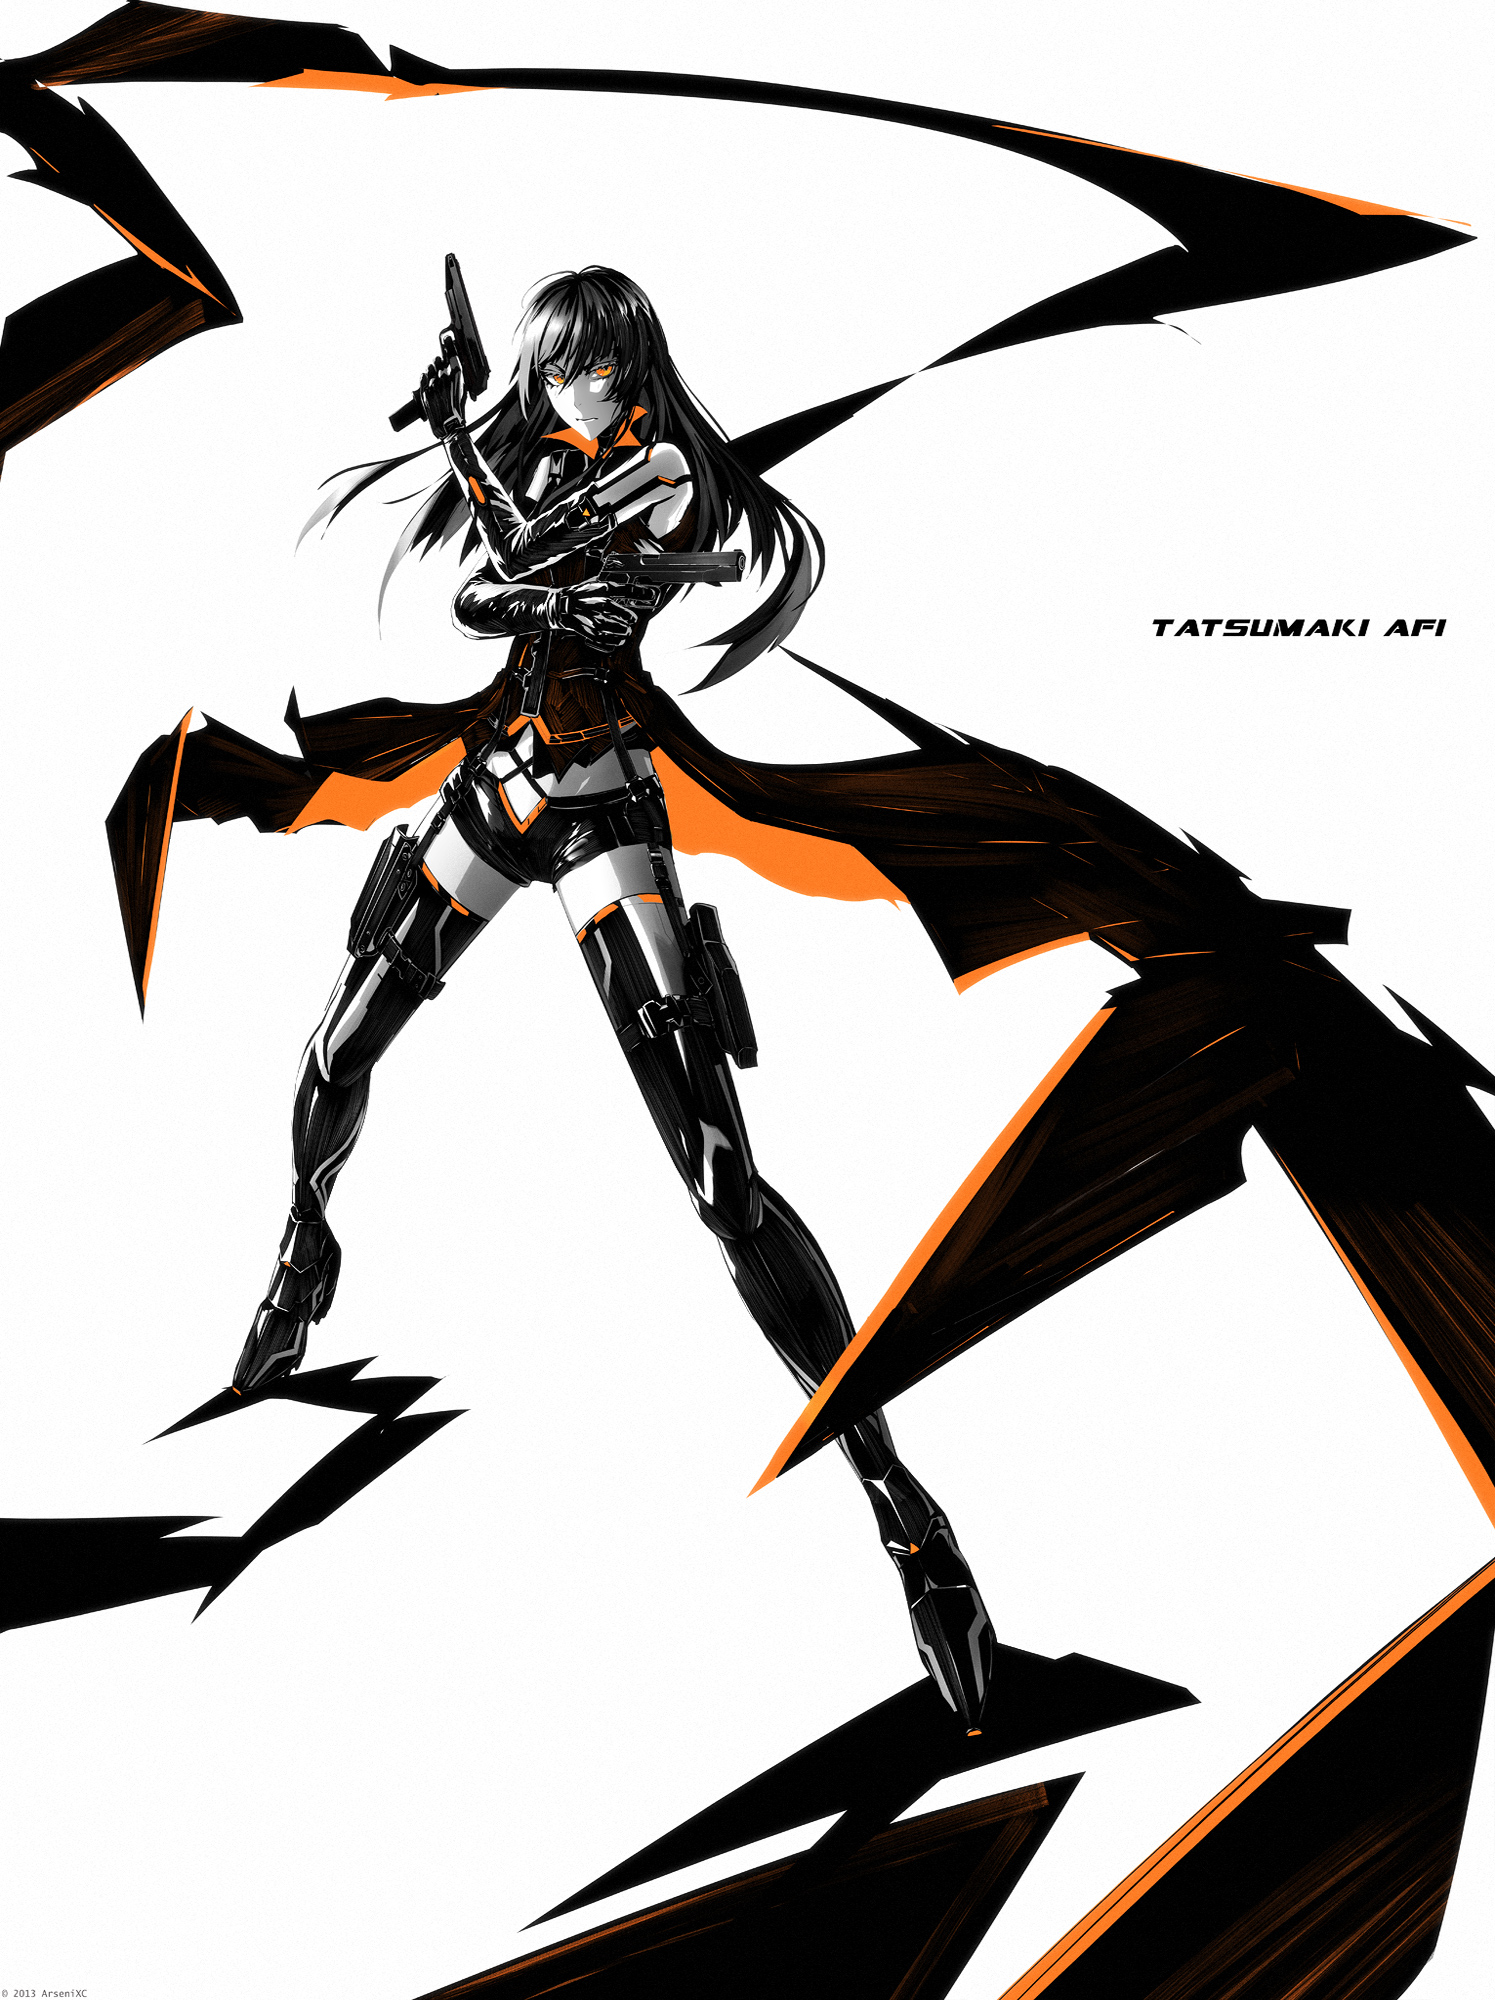 Tatsumaki Afi wrb by arsenixc